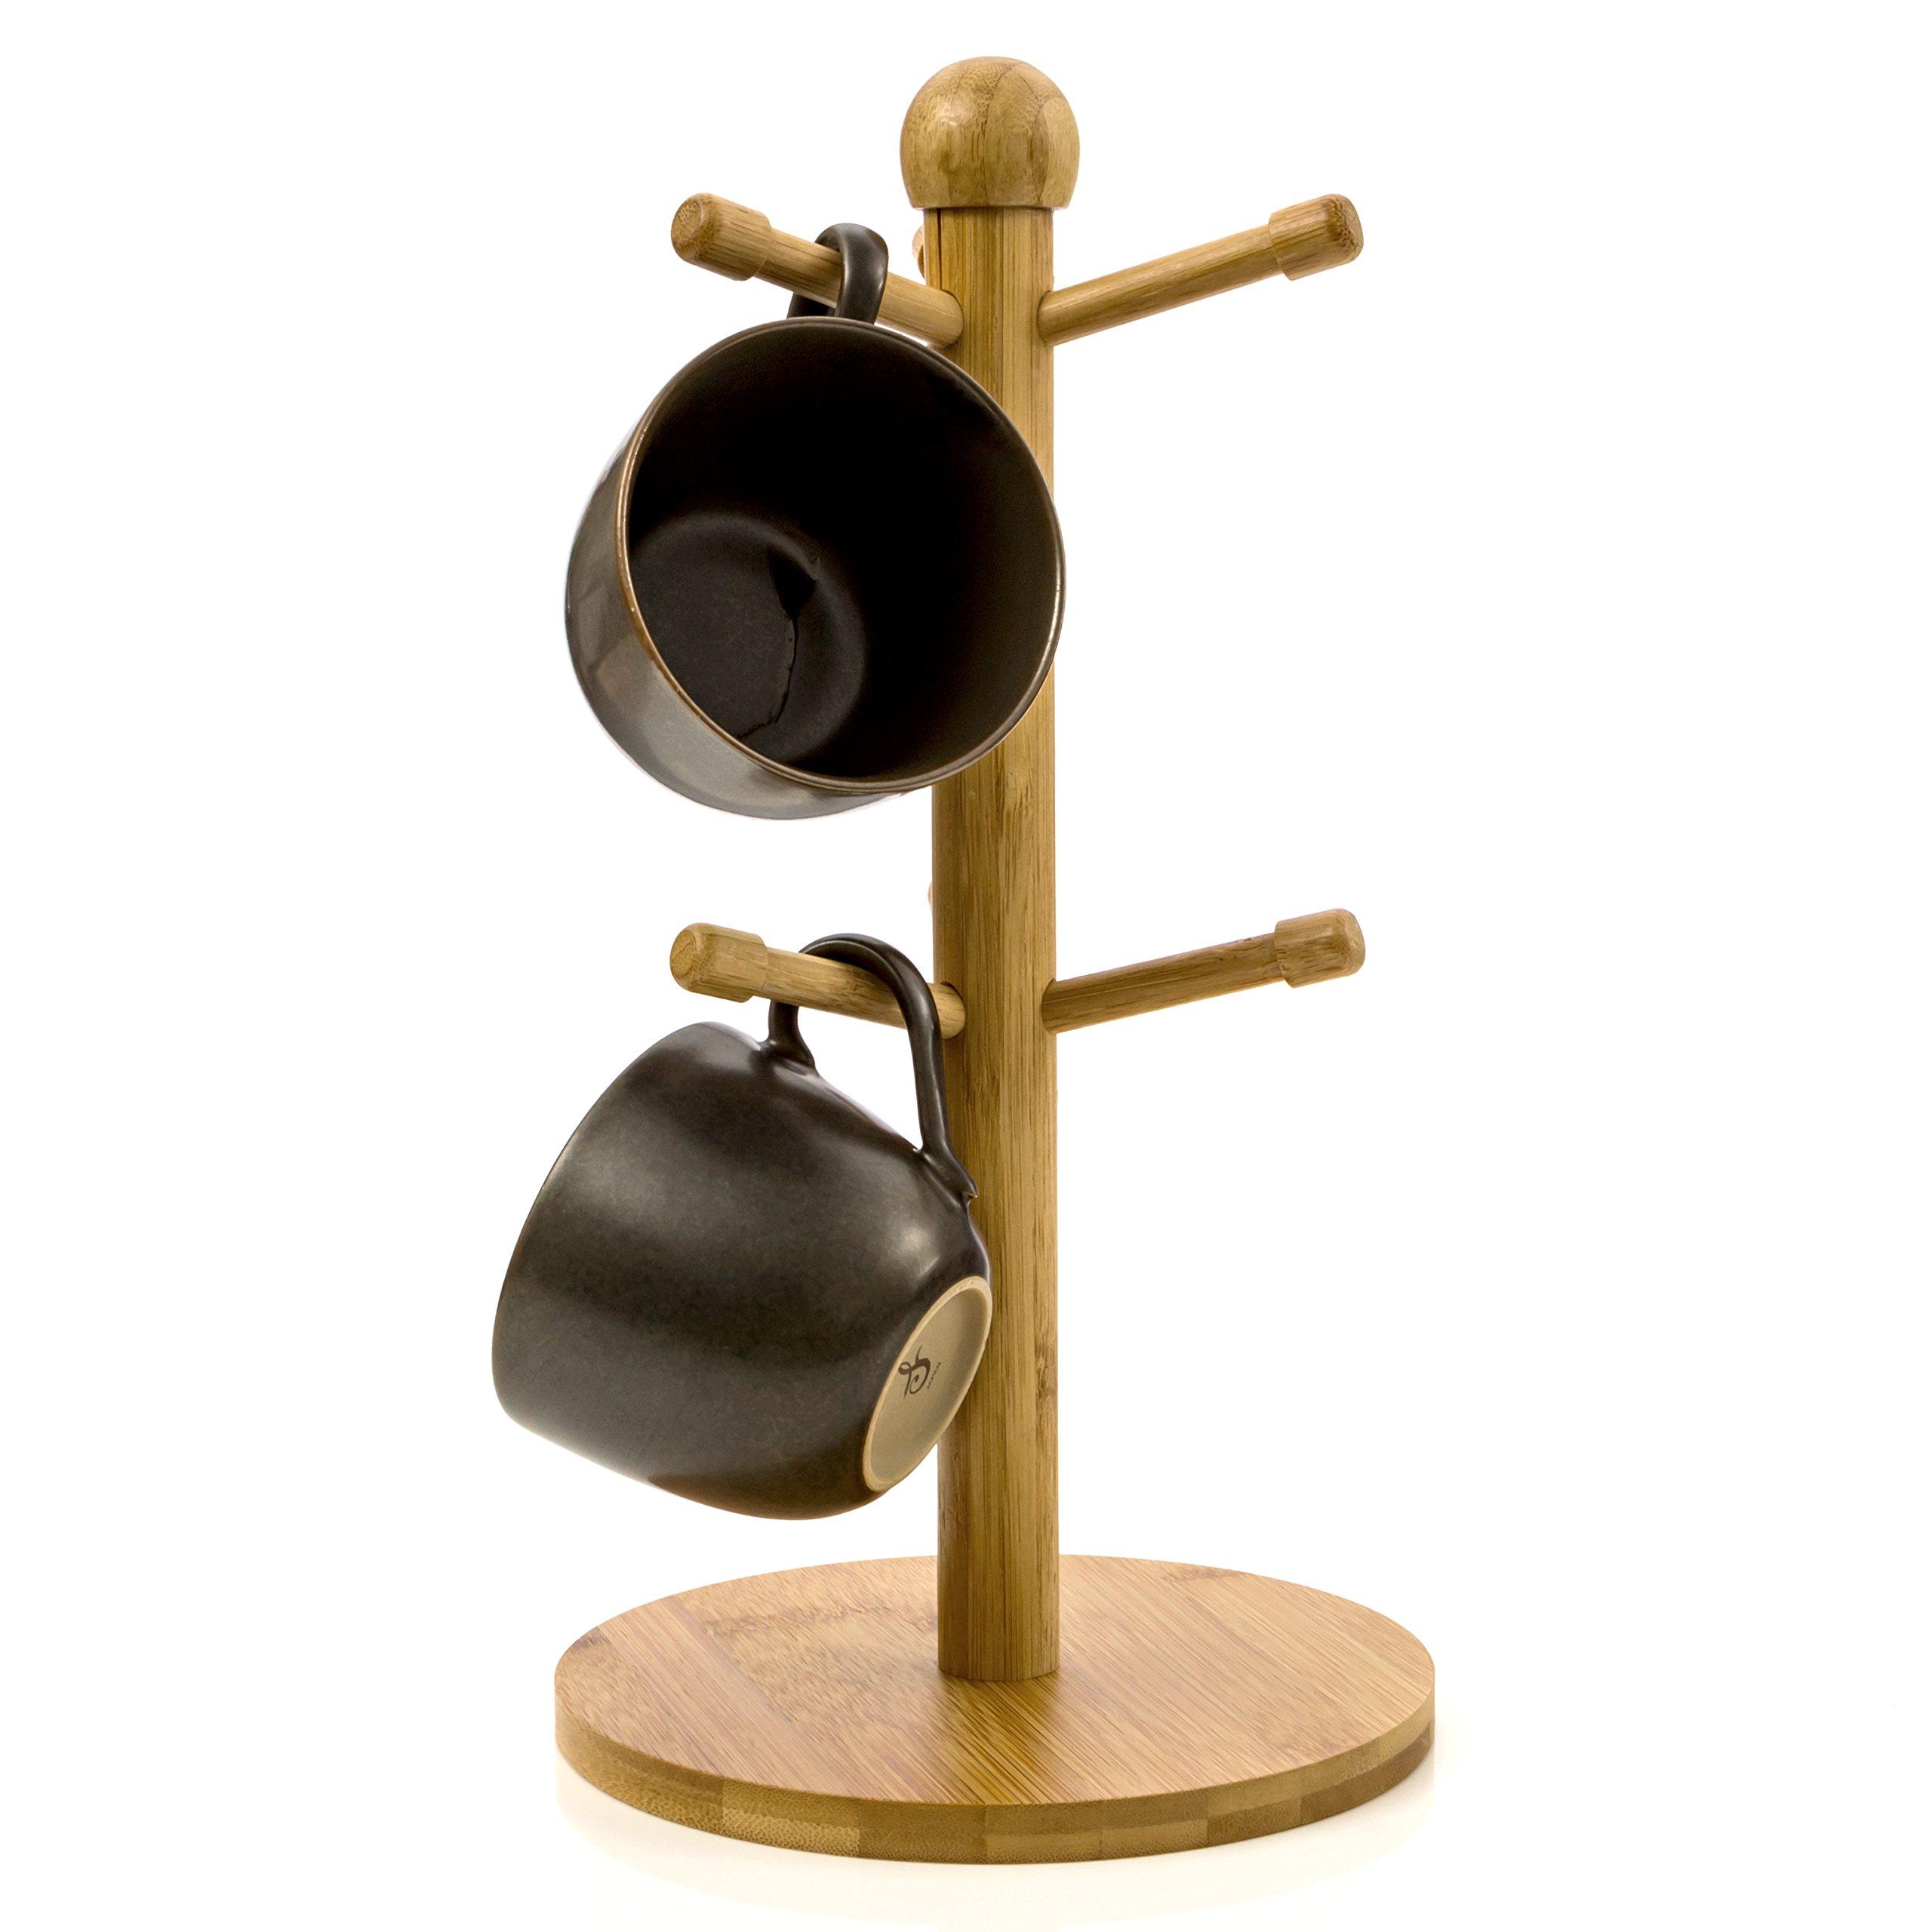 Mug Tree Mug Hook Mug Storage 6 Coffee Cup Mug Tabletop Holder Made of Organic Bamboo Wood By Intriom Bamboo Collection